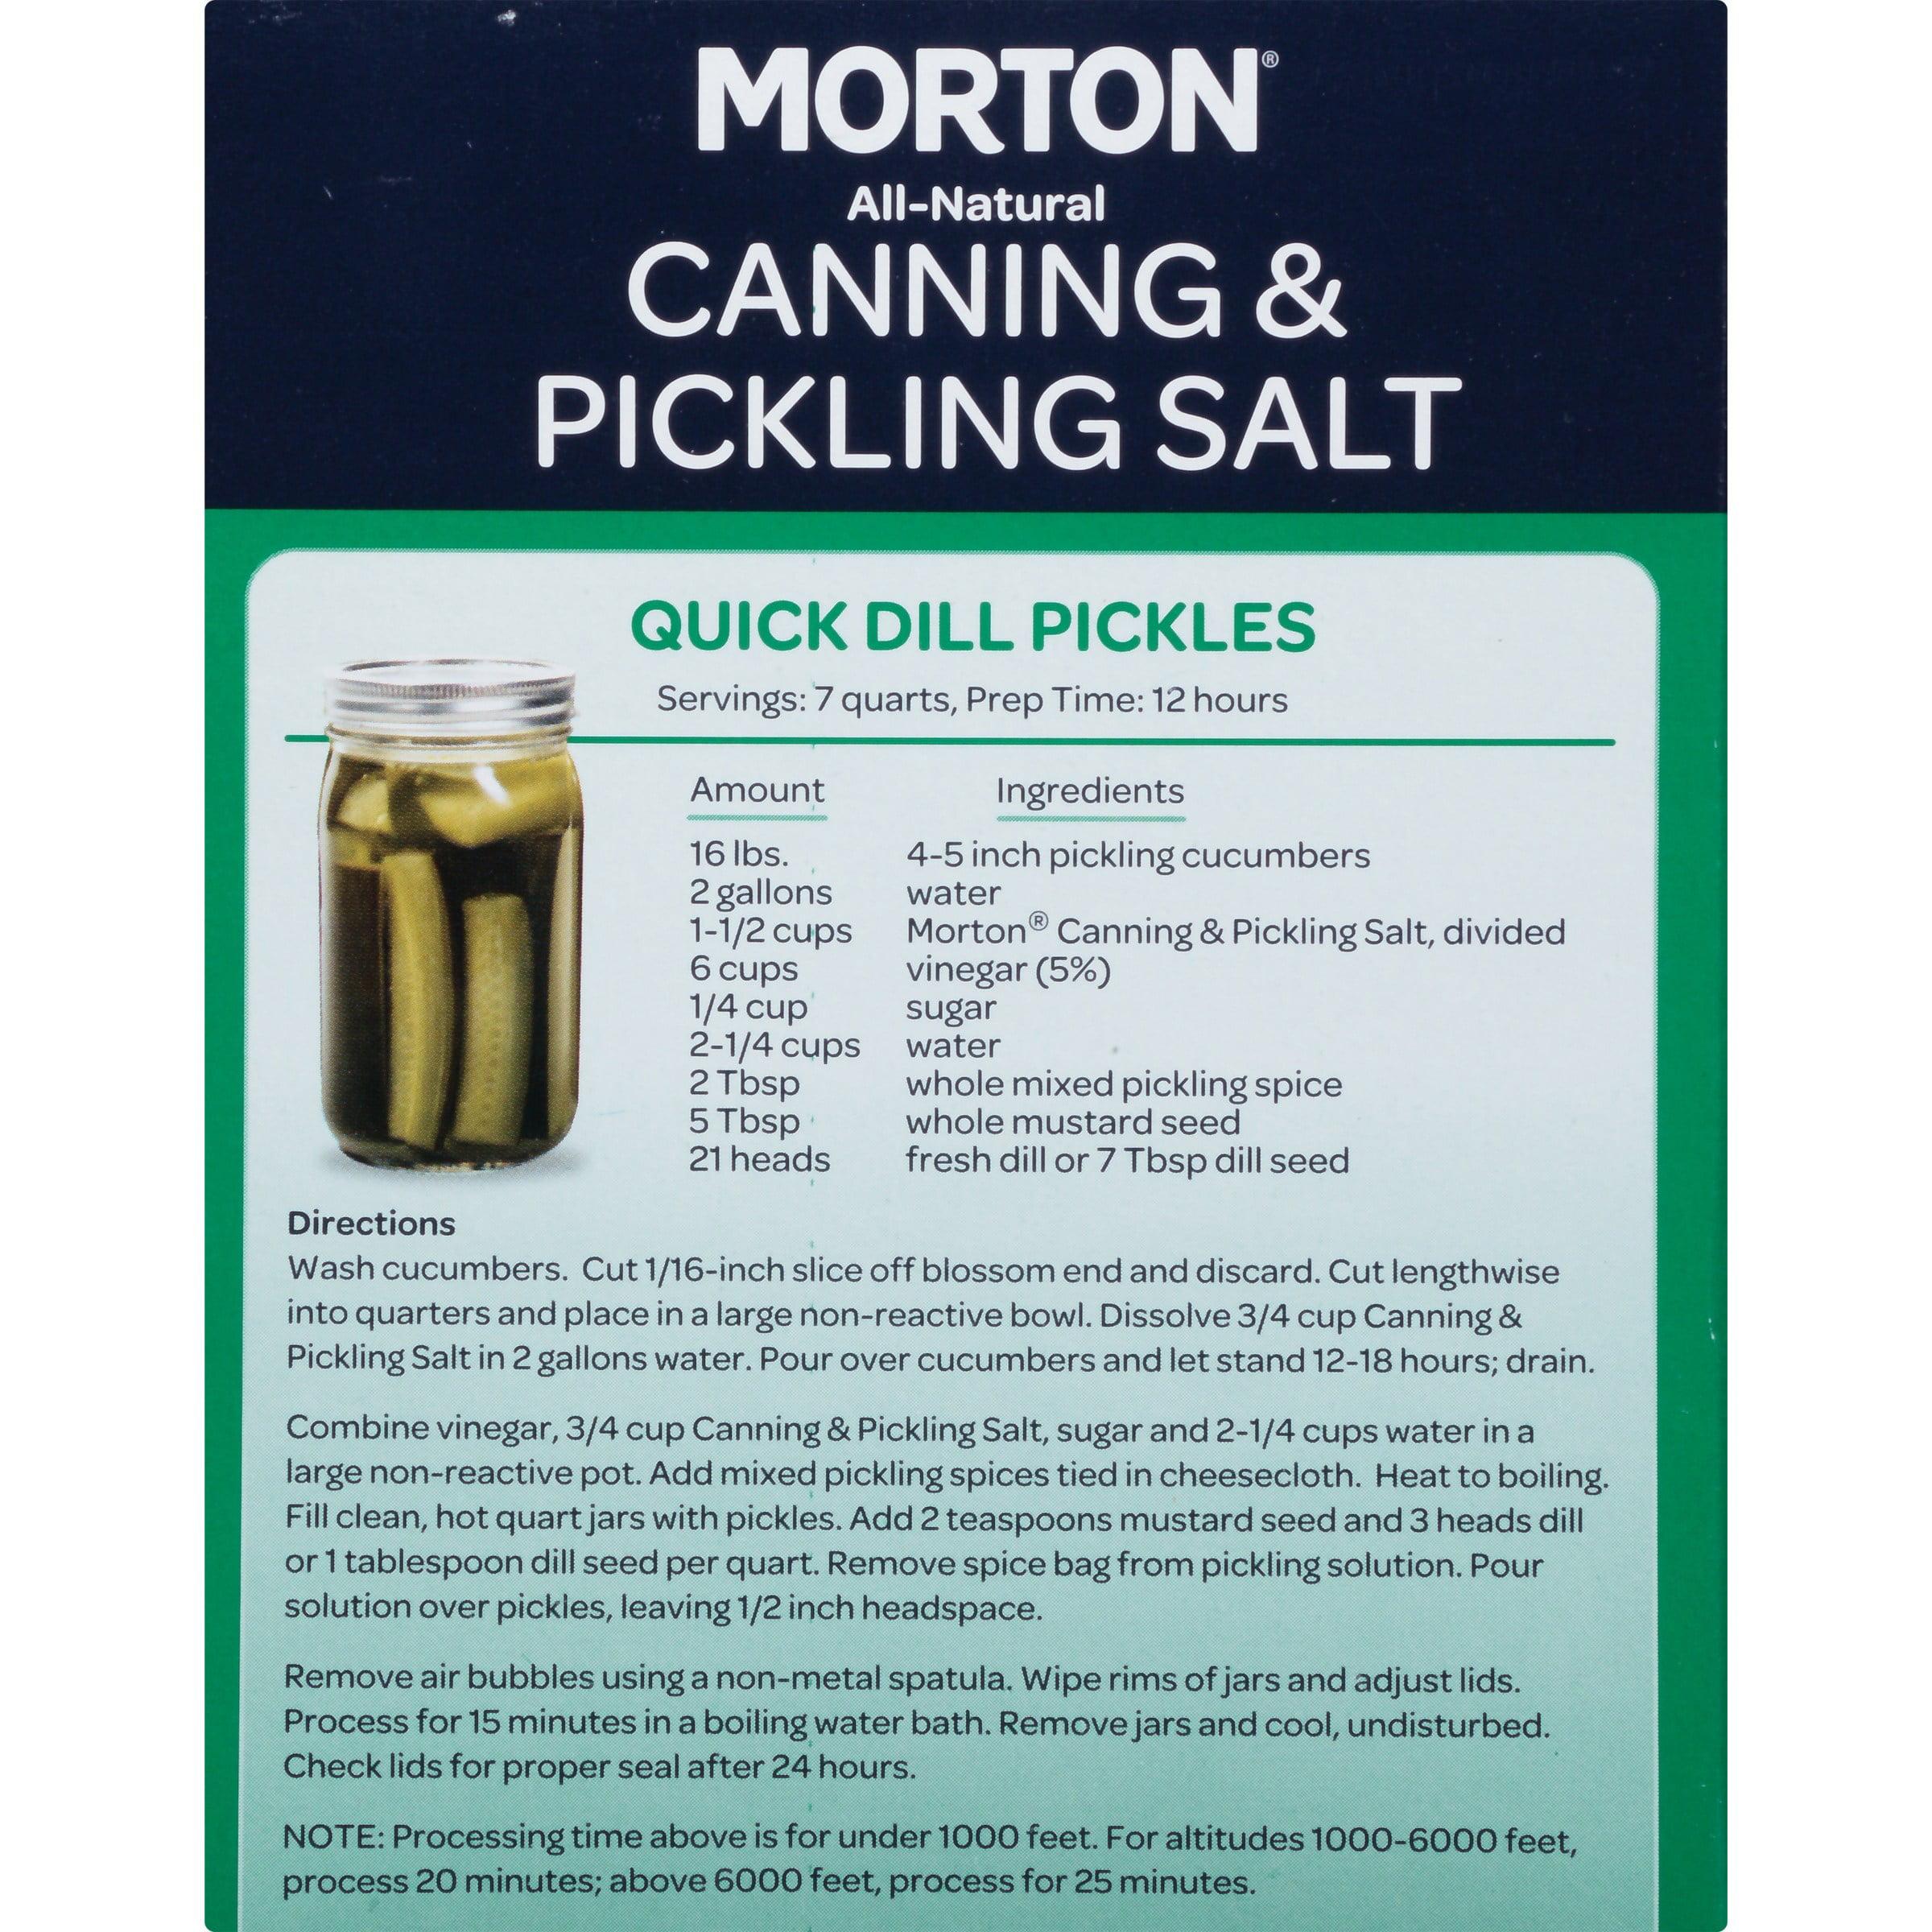 Morton Canning & Pickling Salt 4 lb Box Walmart